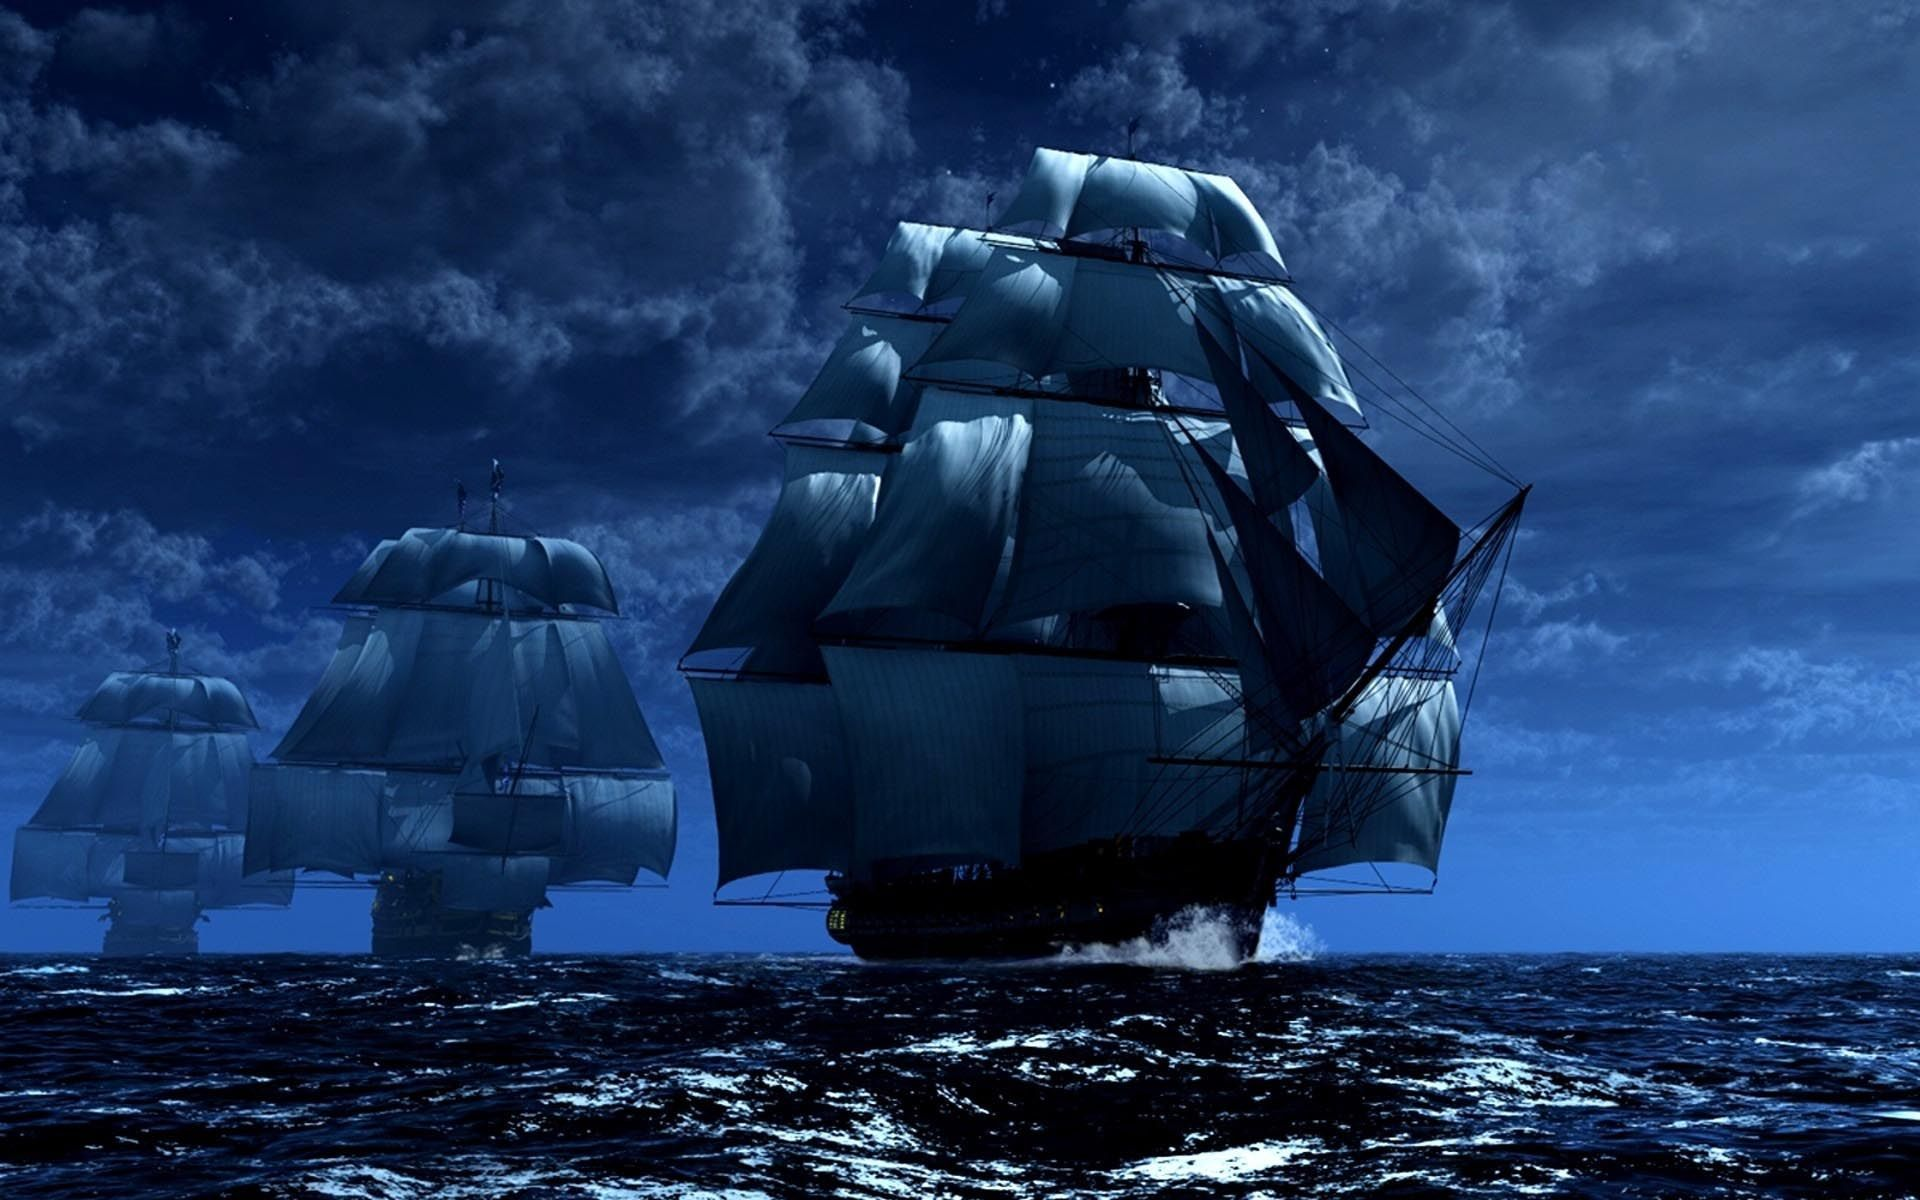 Обои корабль, парусник, Облака. Пейзажи foto 15